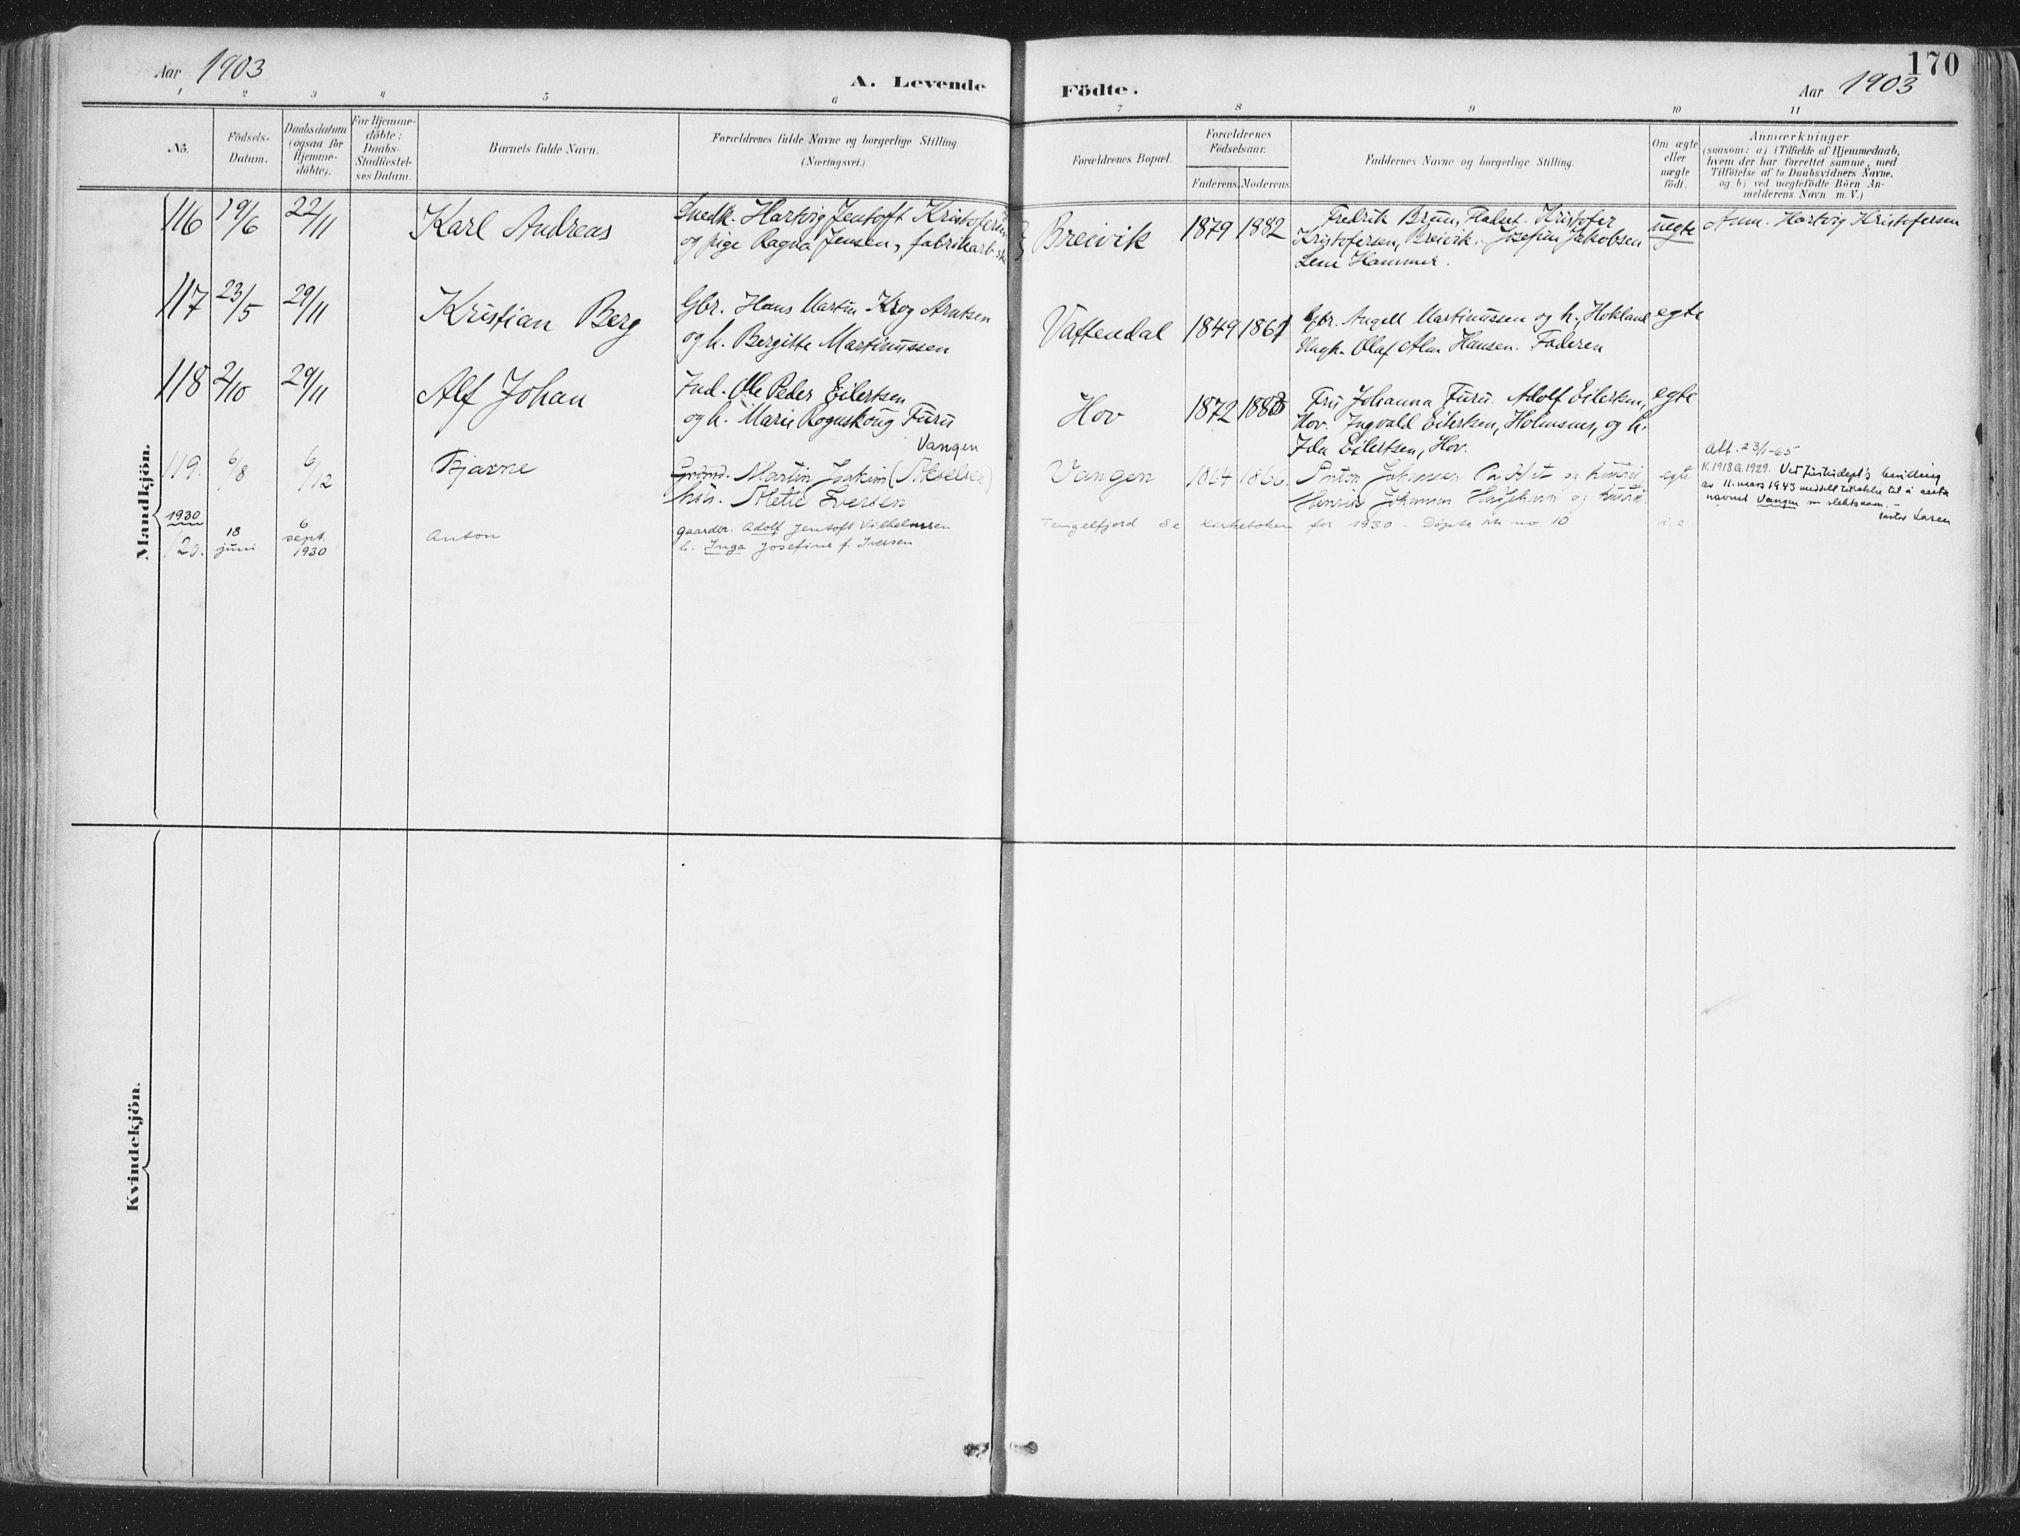 SAT, Ministerialprotokoller, klokkerbøker og fødselsregistre - Nordland, 888/L1246: Ministerialbok nr. 888A12, 1891-1903, s. 170